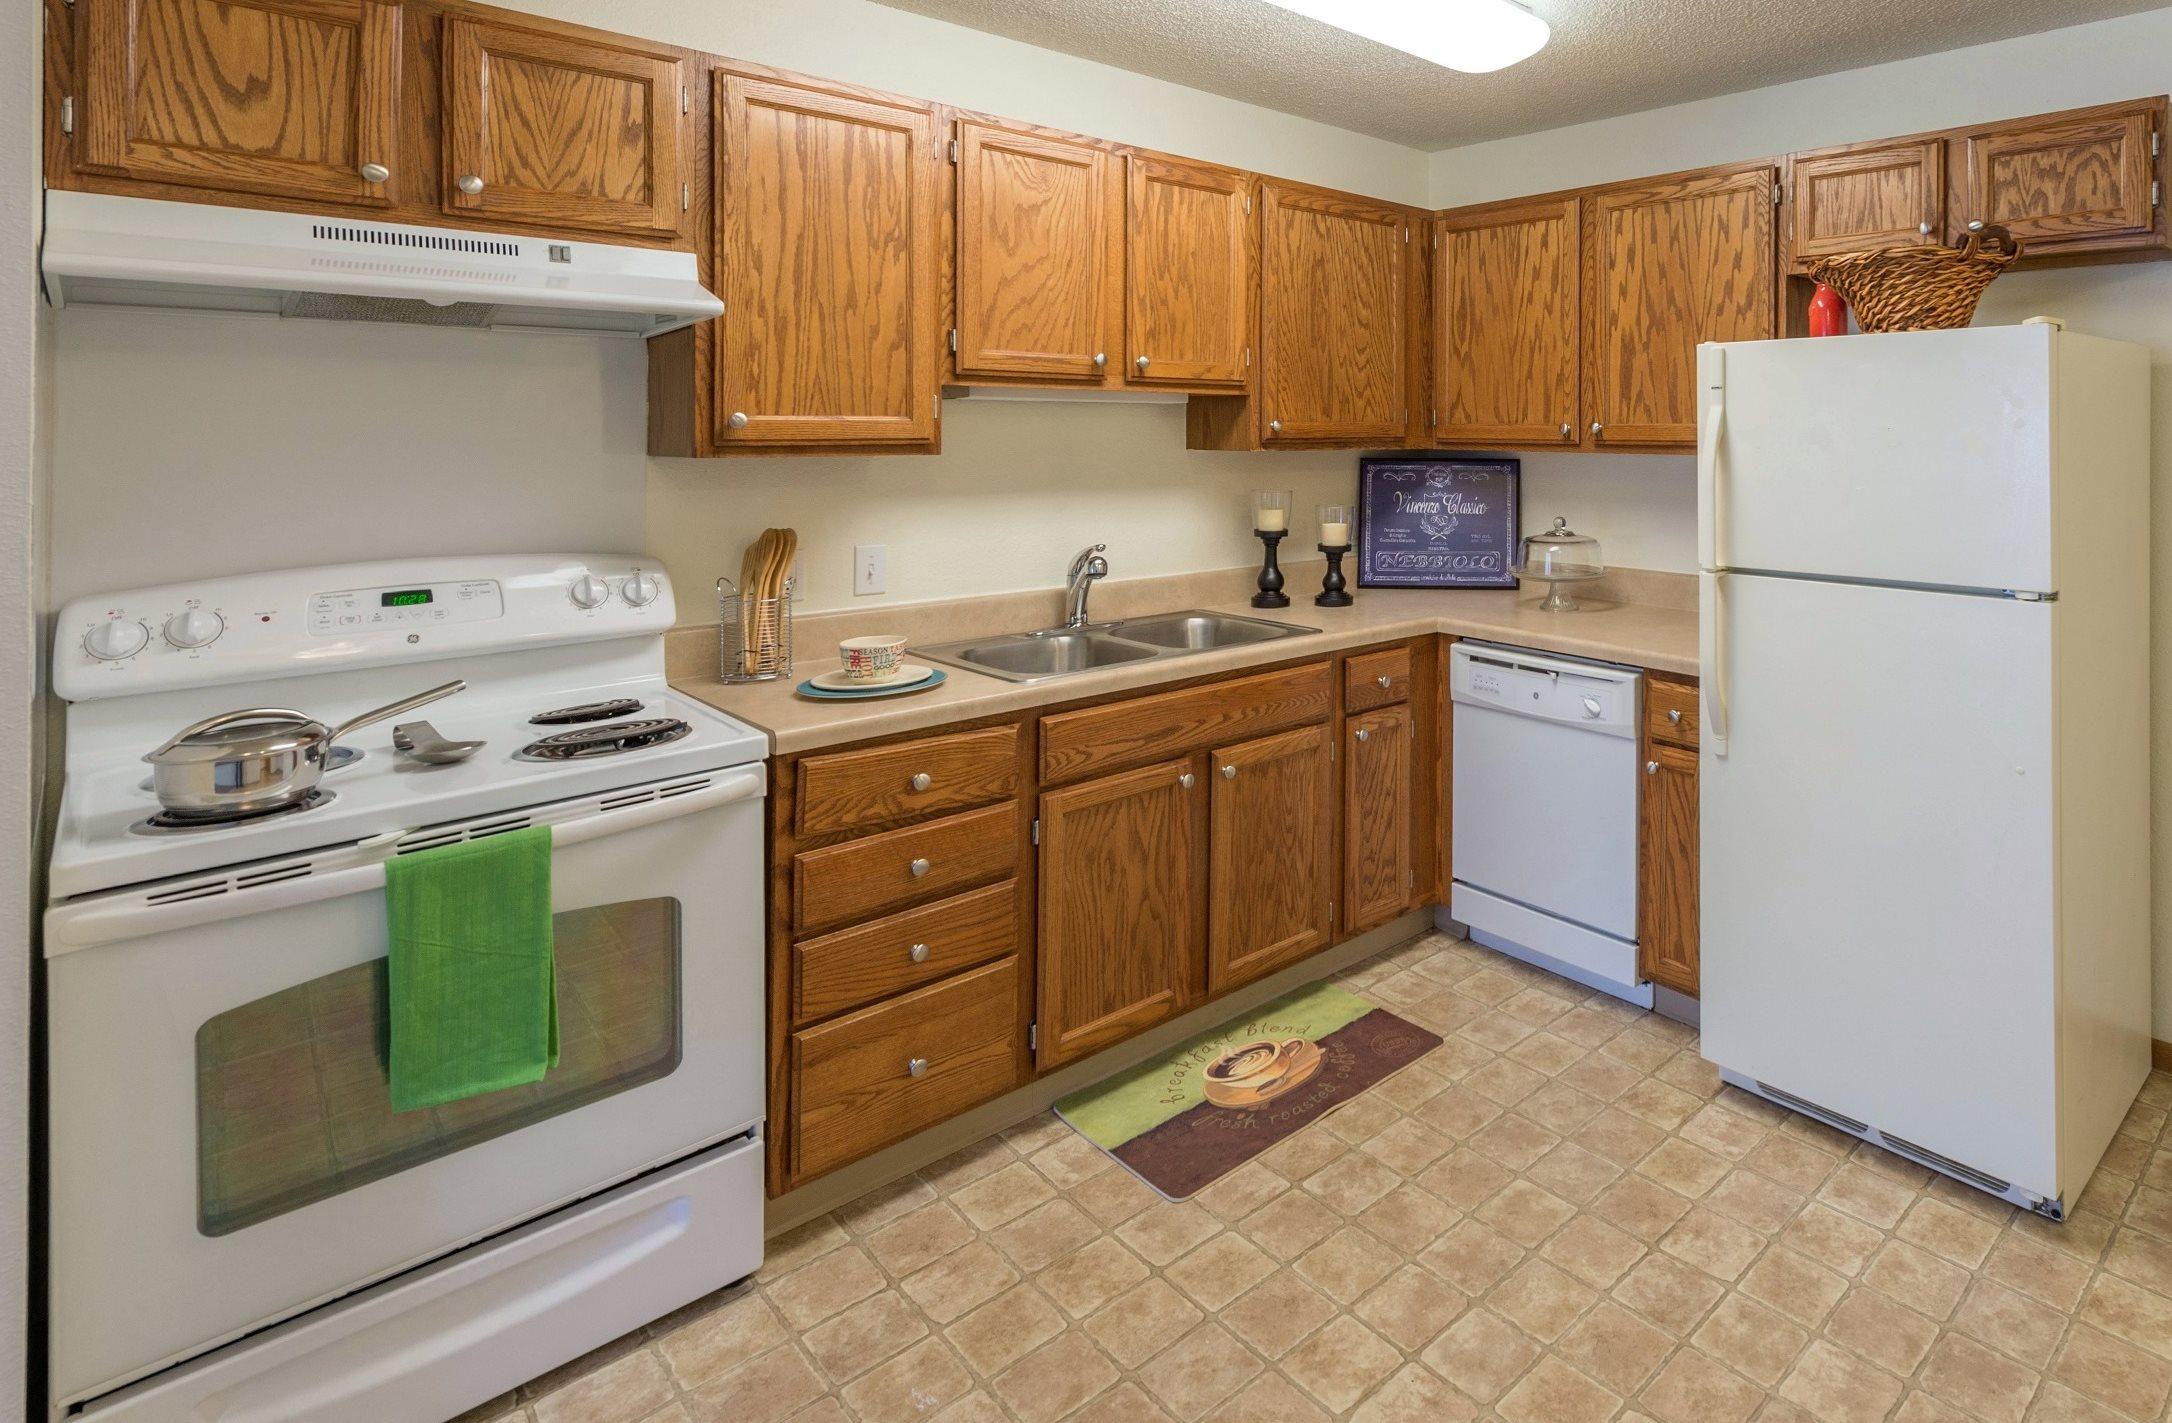 Woodland Park Apartments | Apartments in Anoka, MN